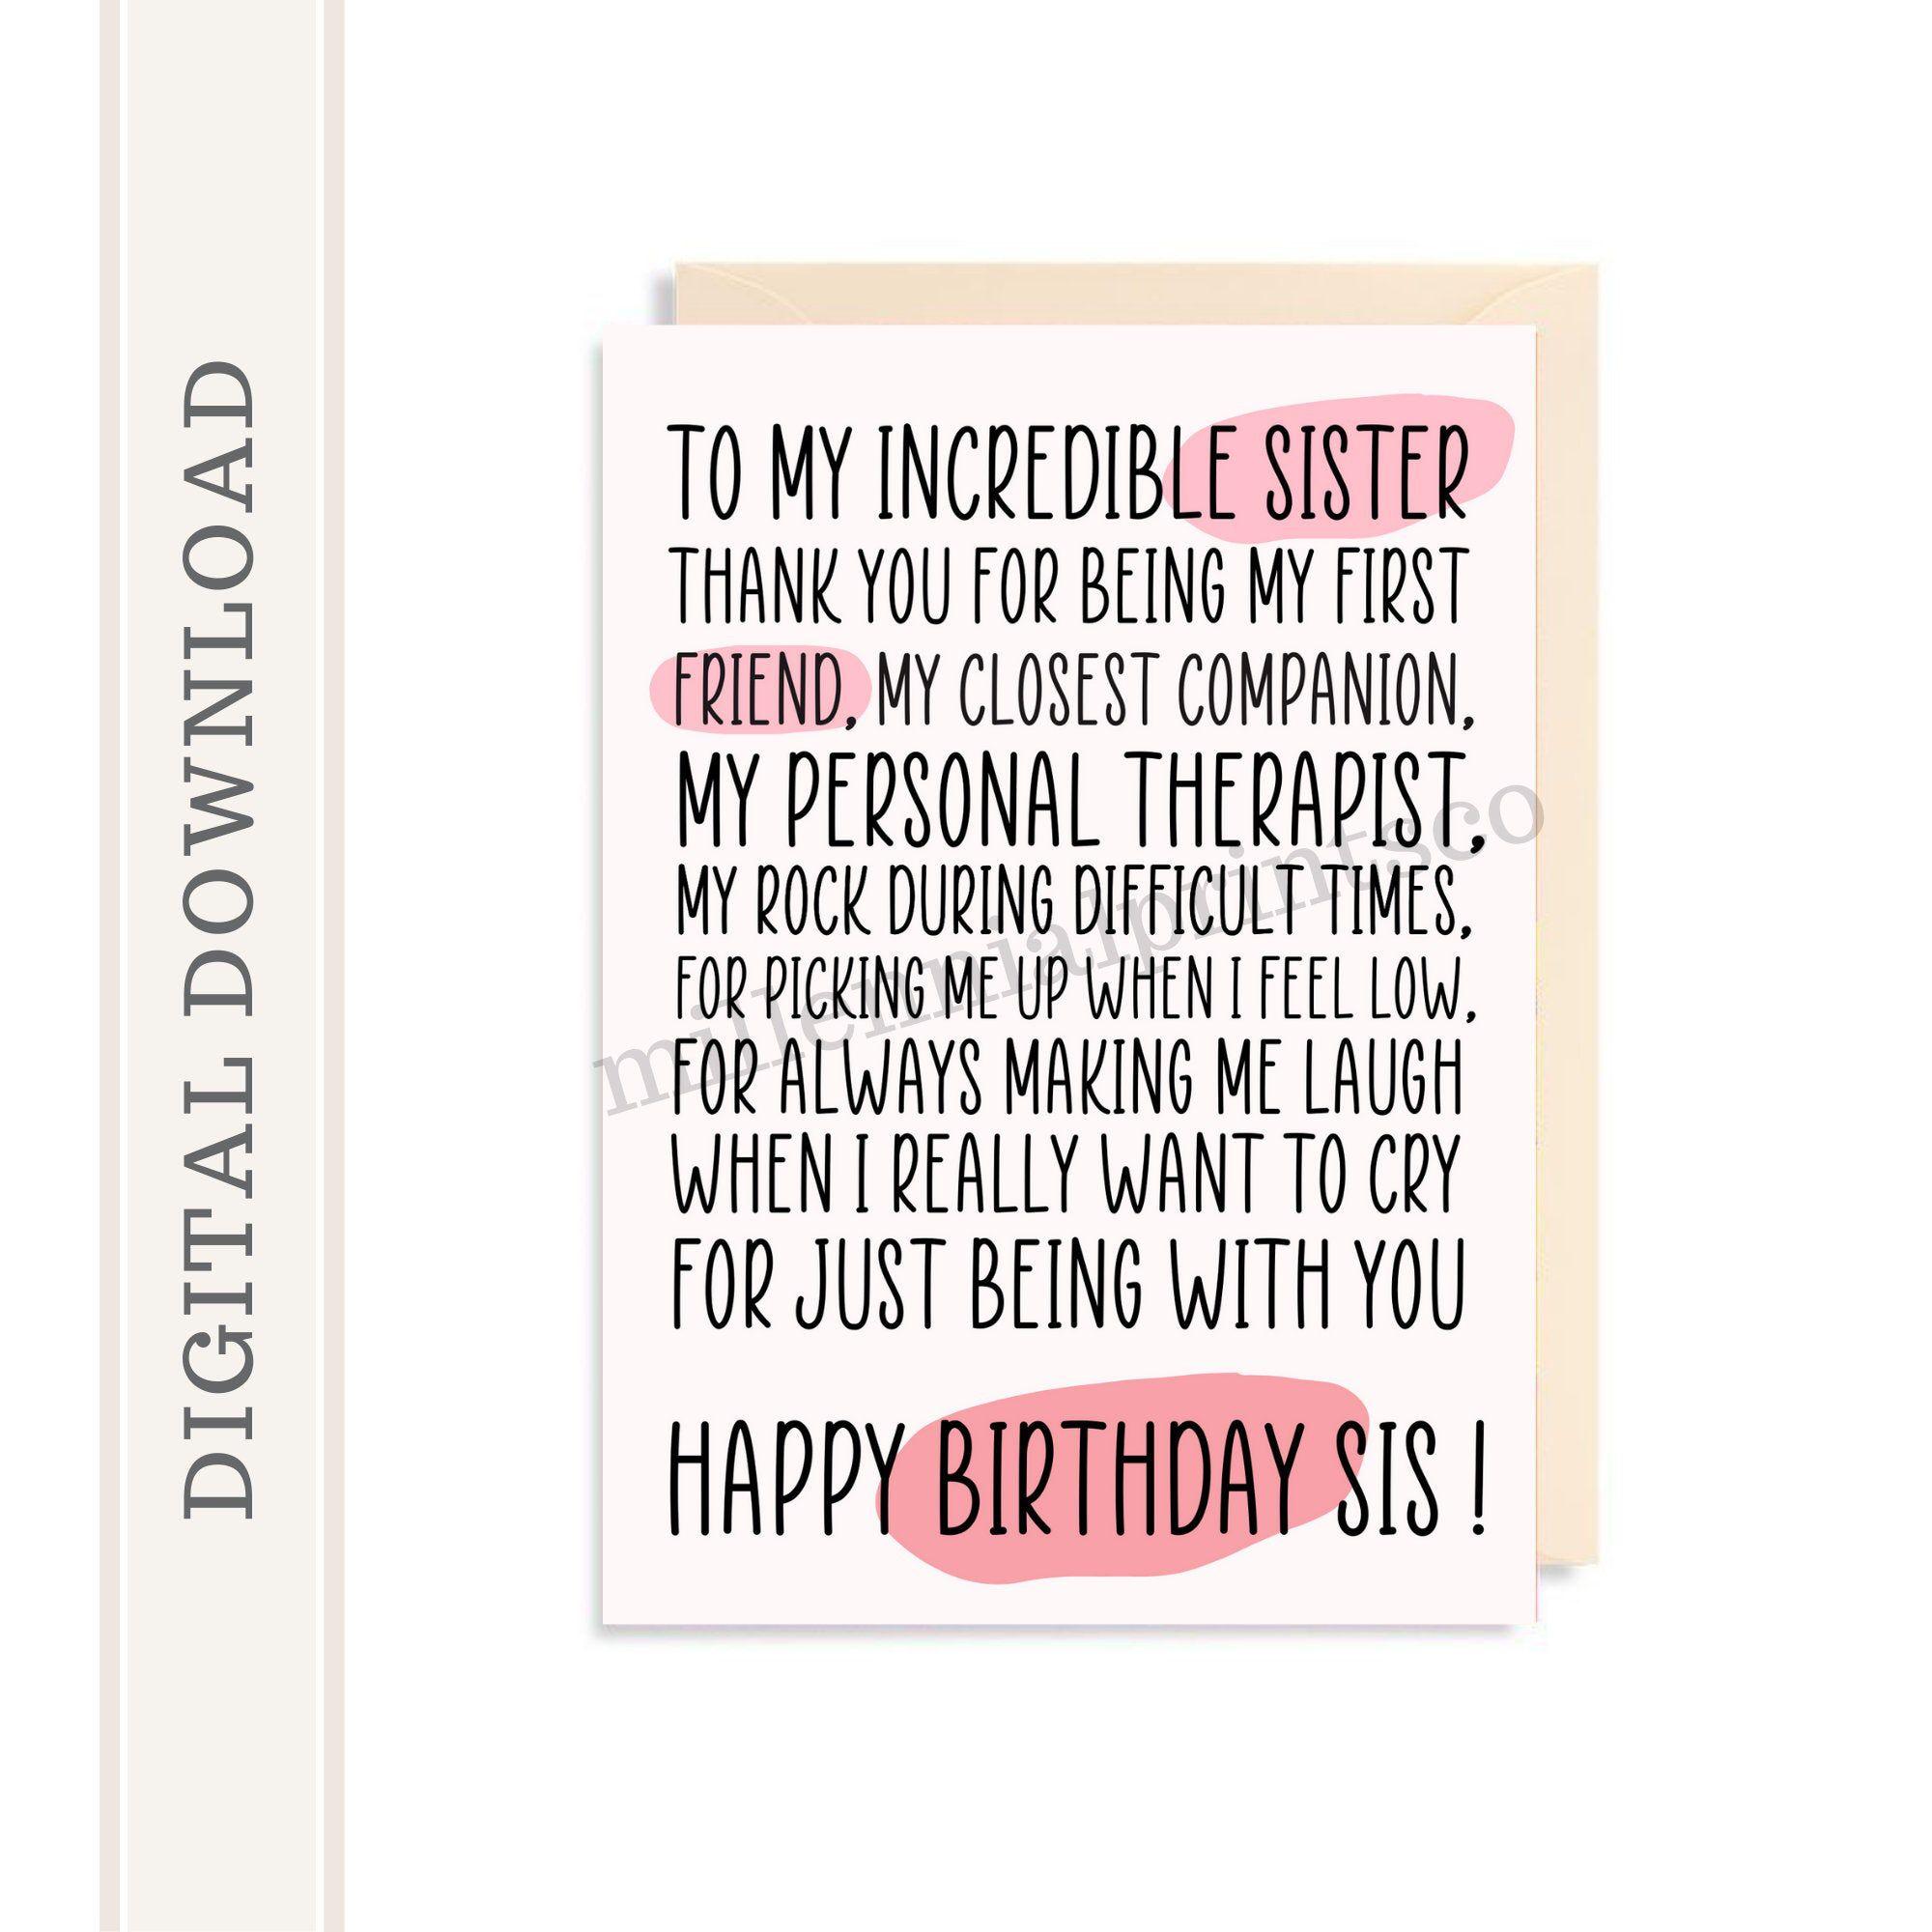 Printable Birthday Card For Sister Cute Sister Card Sister Etsy Sister Birthday Card Message For Sister Birthday Card Printable